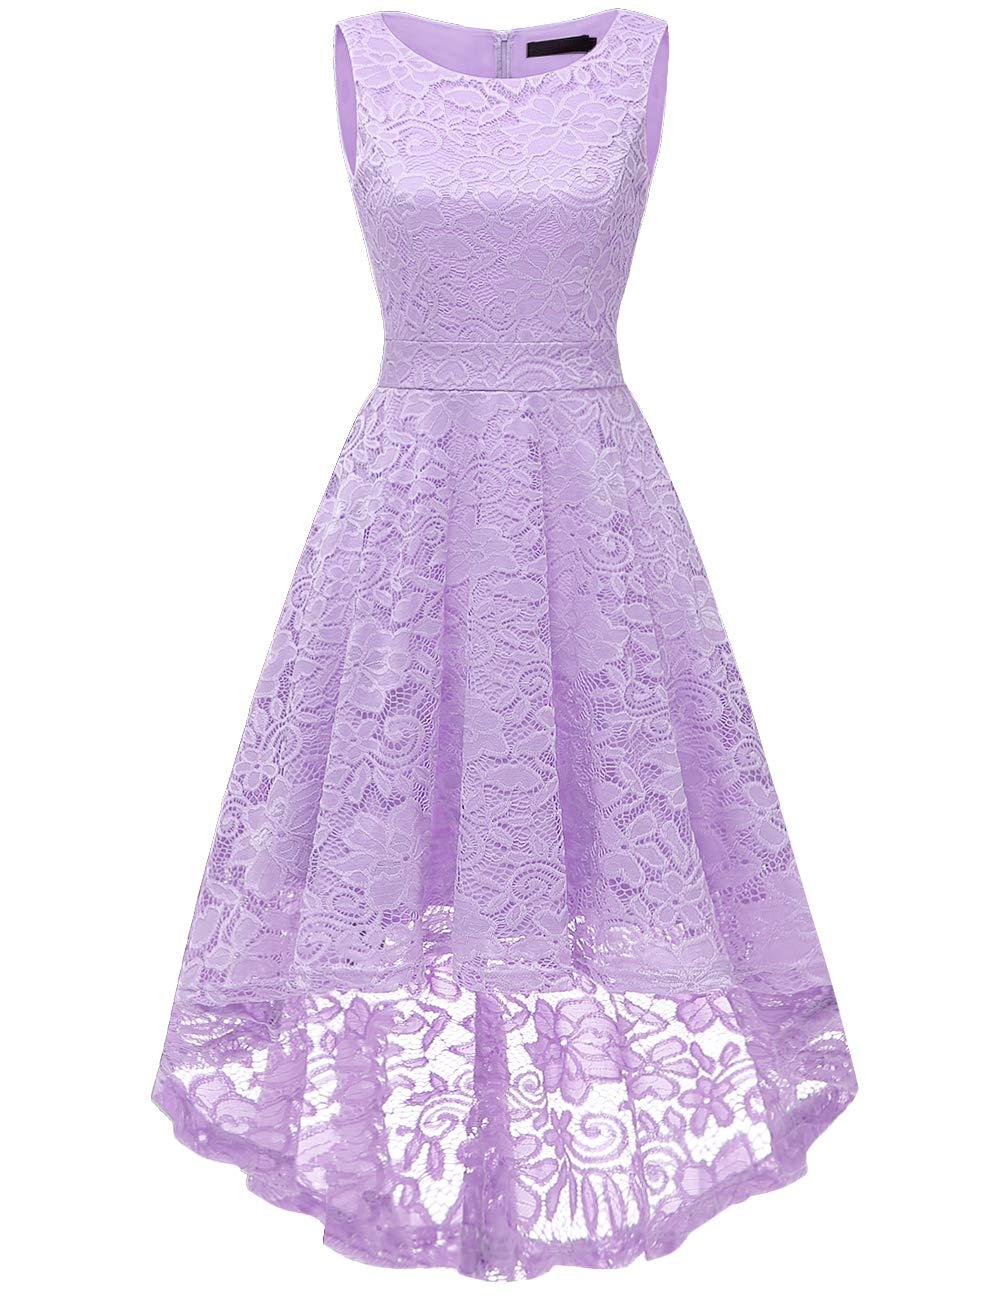 DRESSTELLS Women's Homecoming Vintage Floral Lace Hi-Lo Cocktail Formal Swing Dress Dress Lavender XL